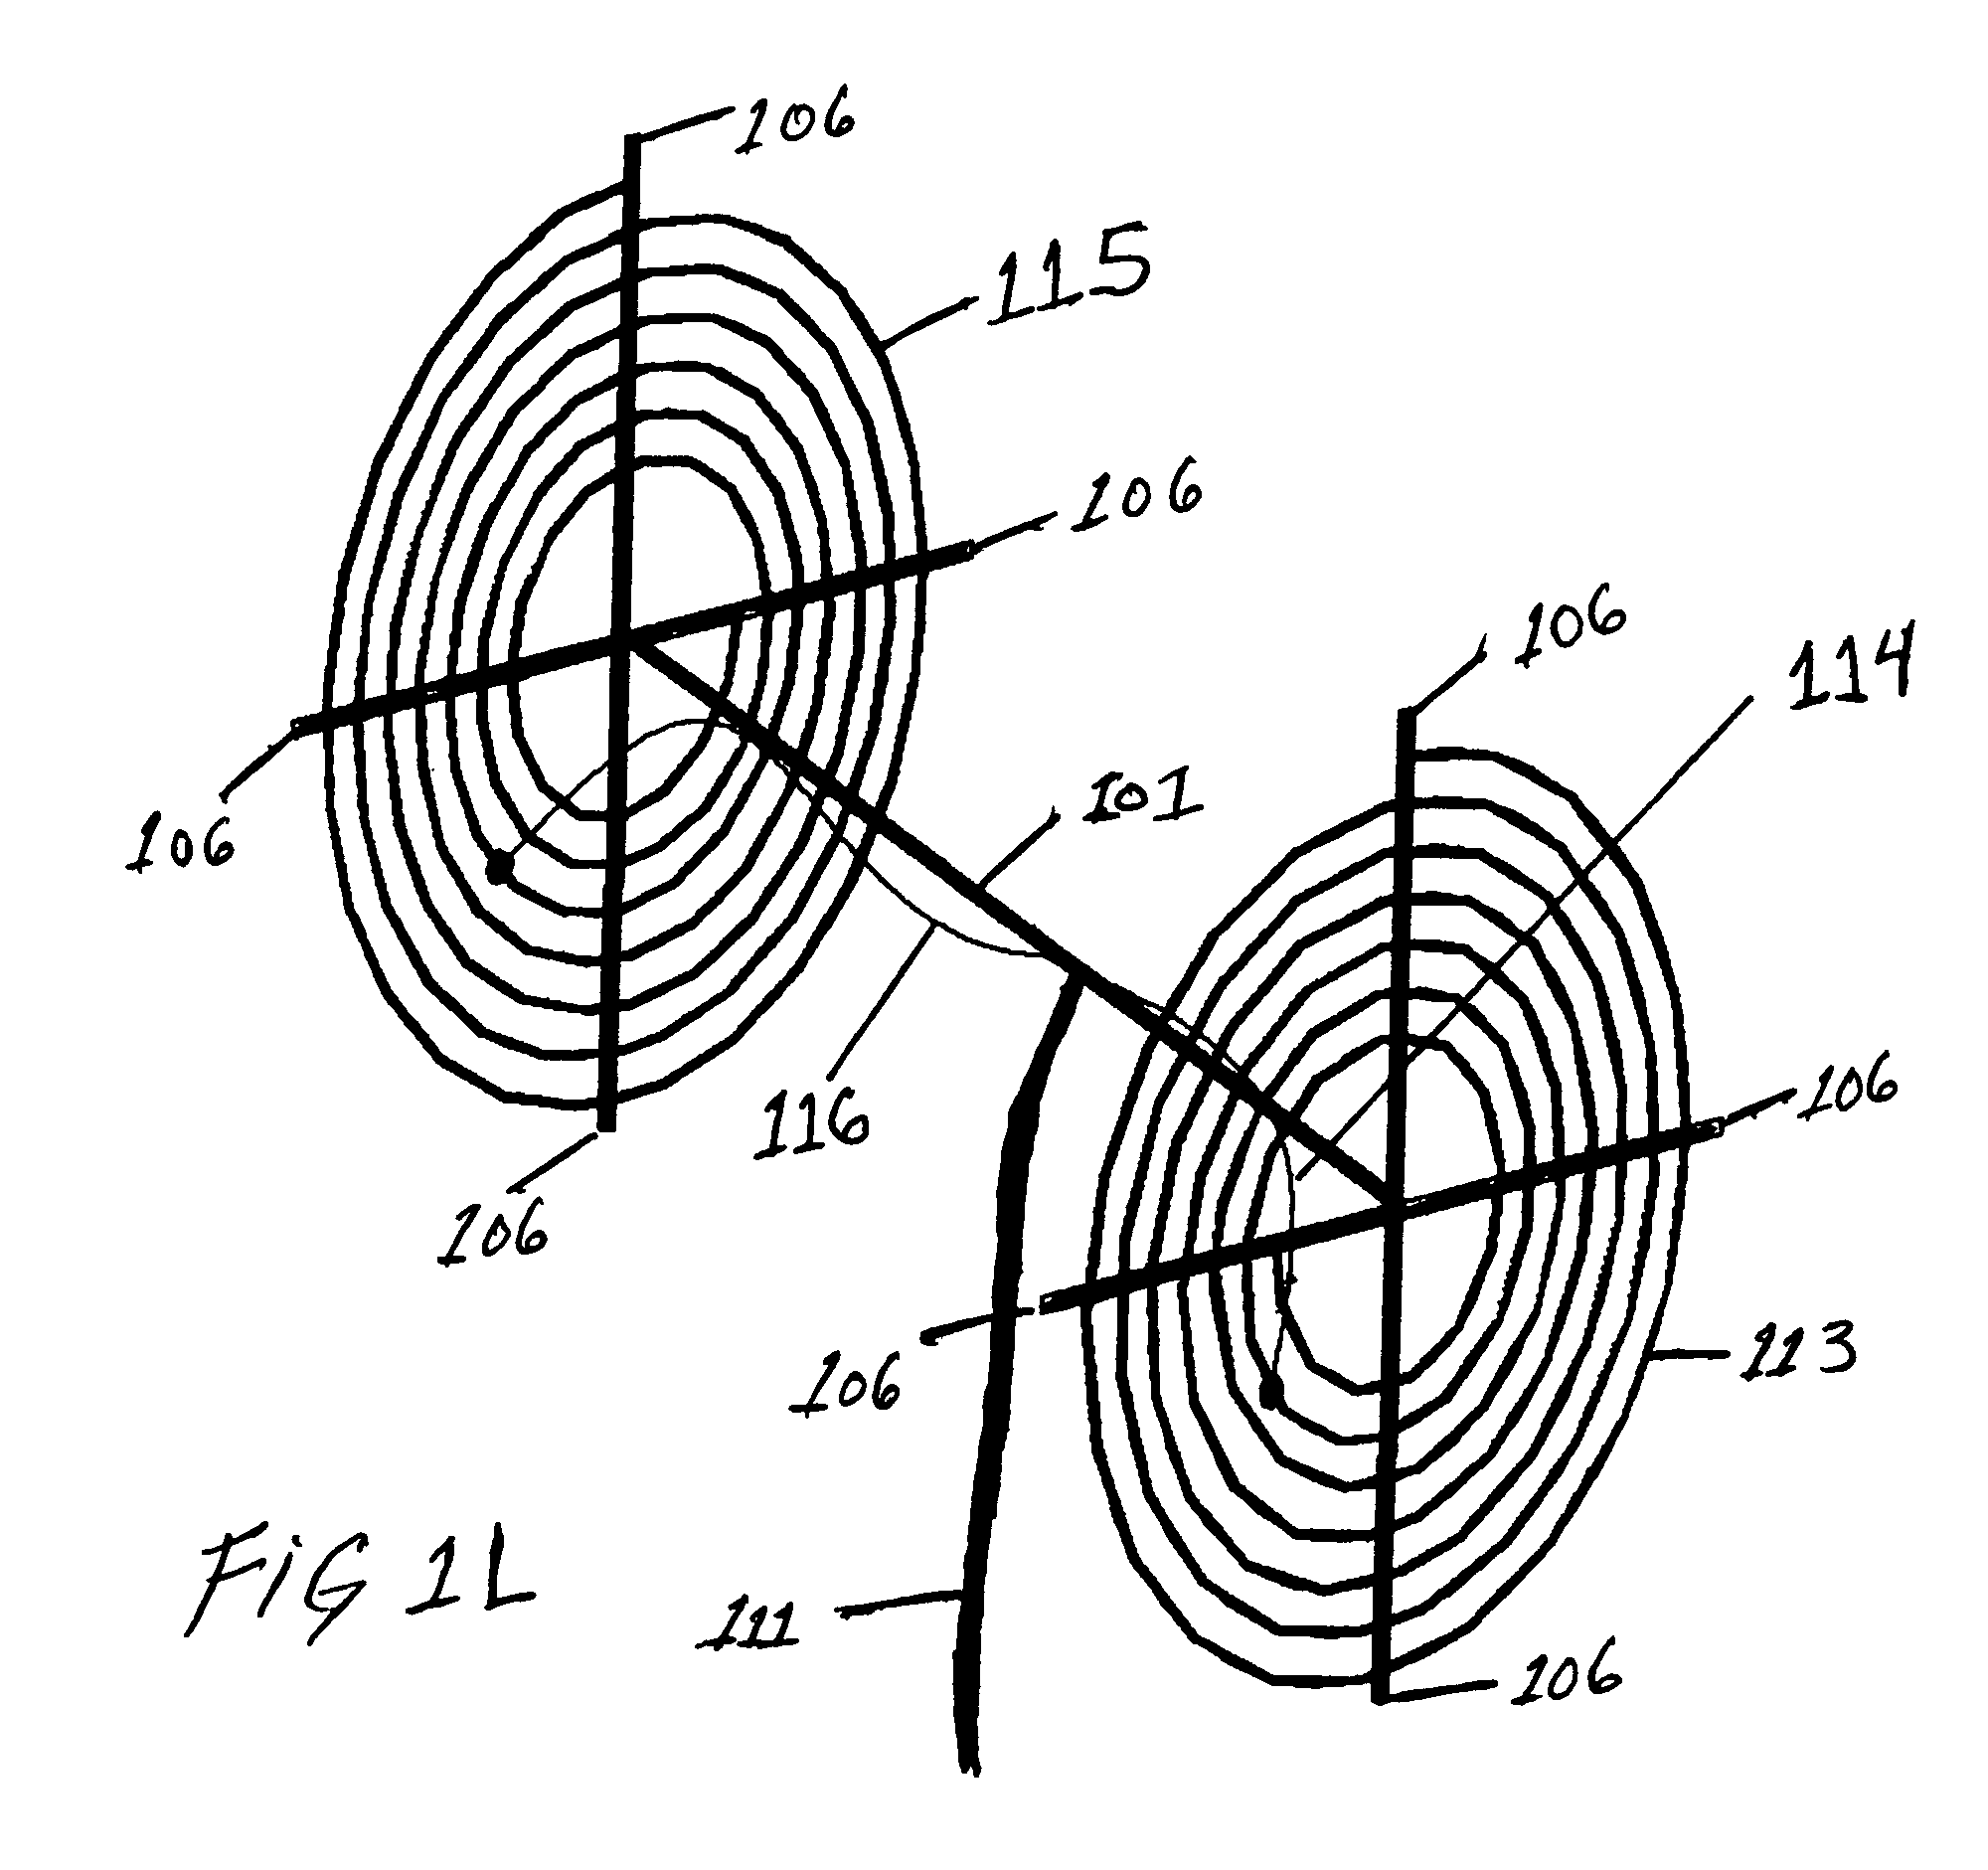 Uniden Cb Mic Wiring Diagram